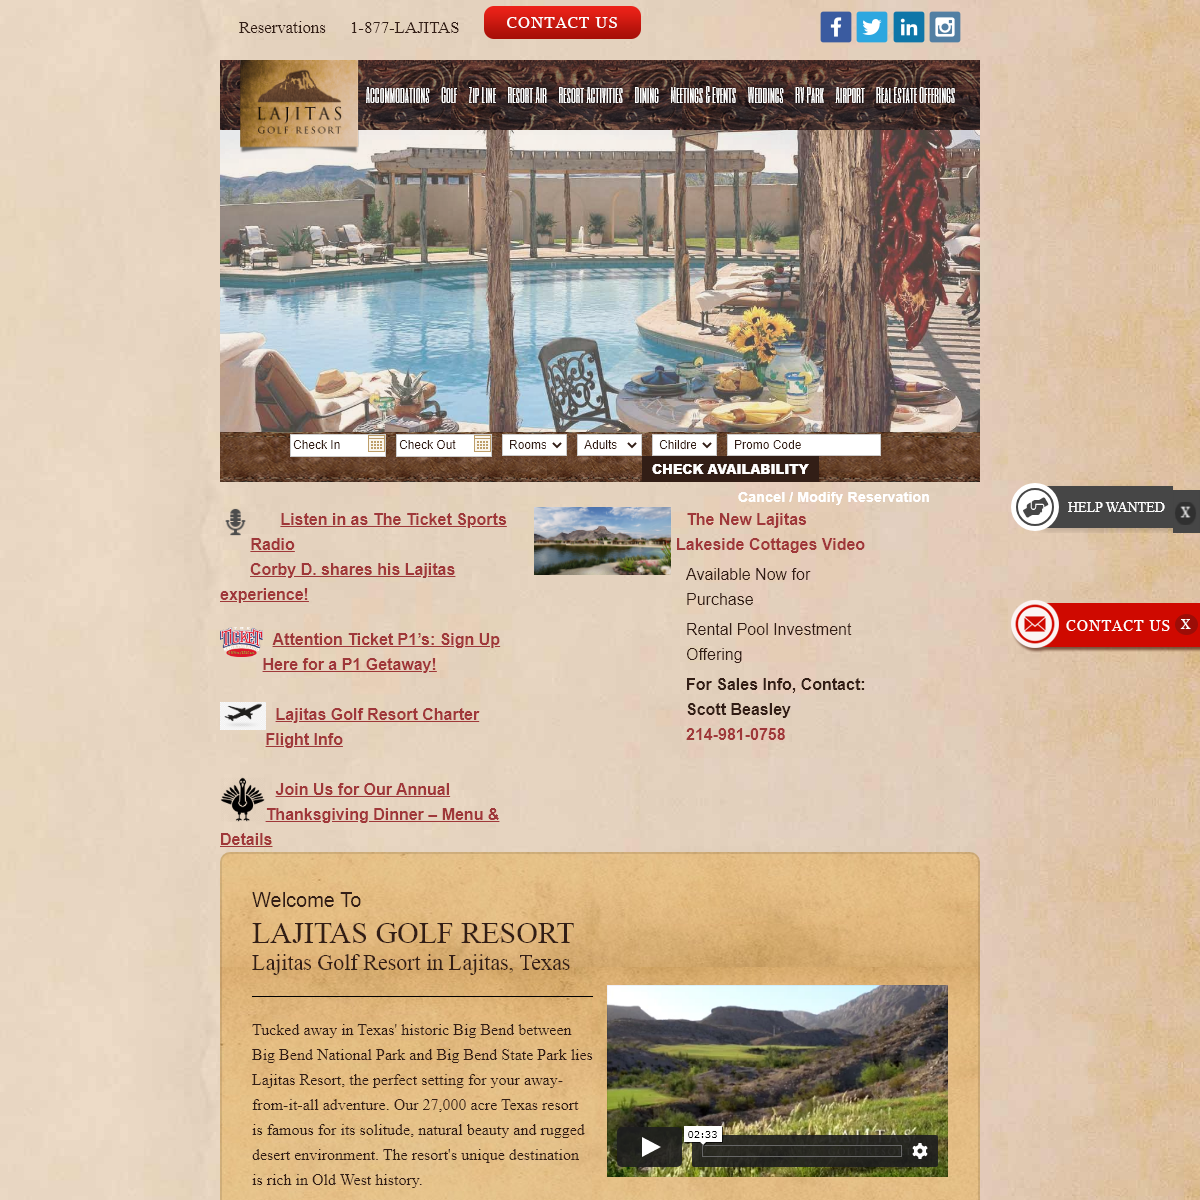 Lajitas Golf Resort and Spa, A 4-star hotel in Lajitas, Texas